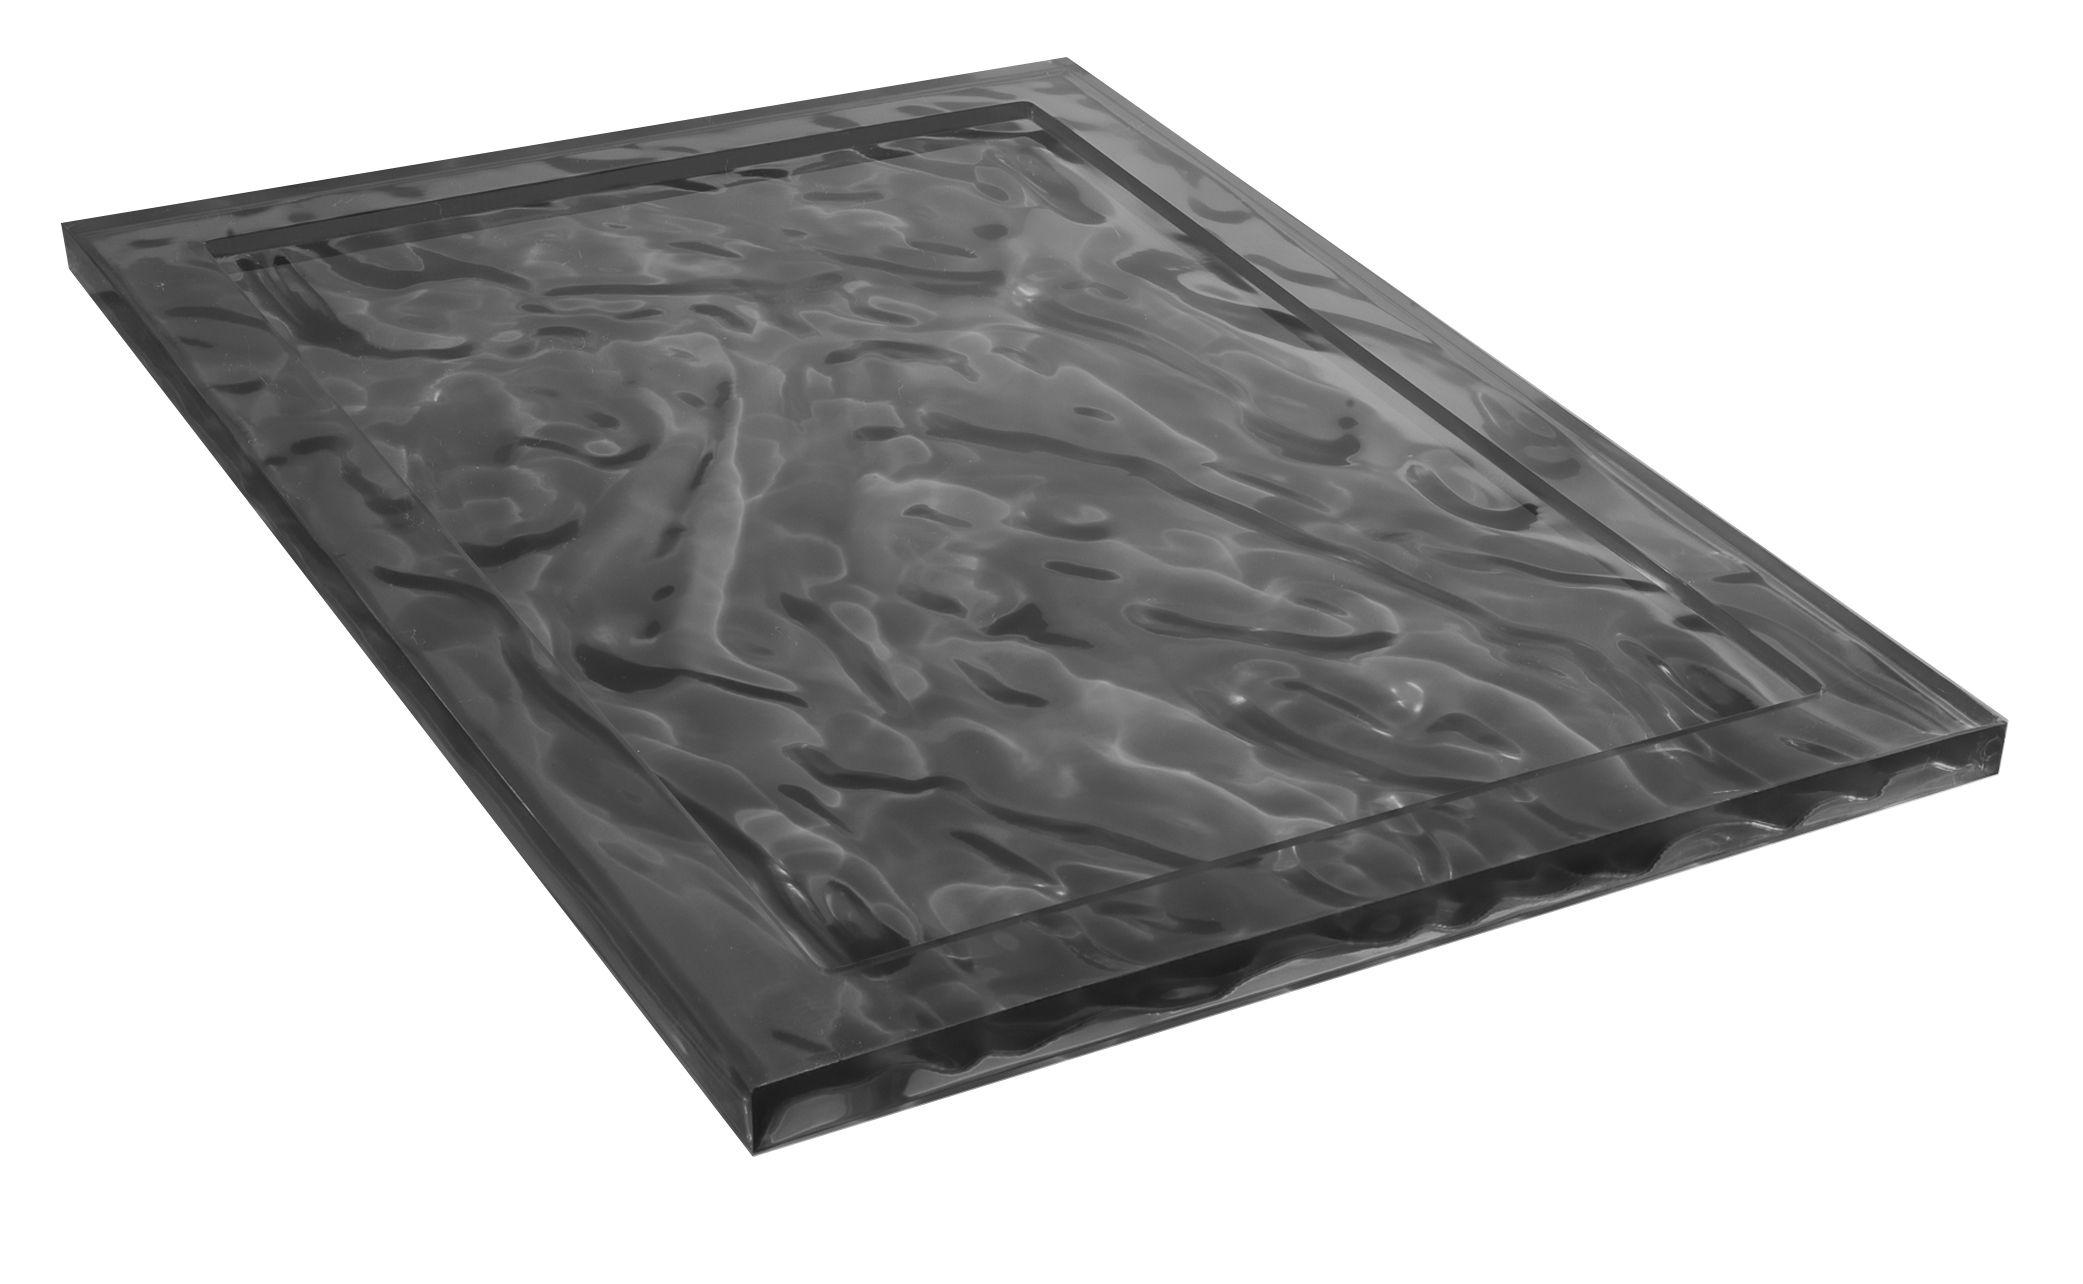 Tavola - Vassoi  - Piano/vassoio Dune - 55 x 38 cm di Kartell - Fumé - Tecnopolimero